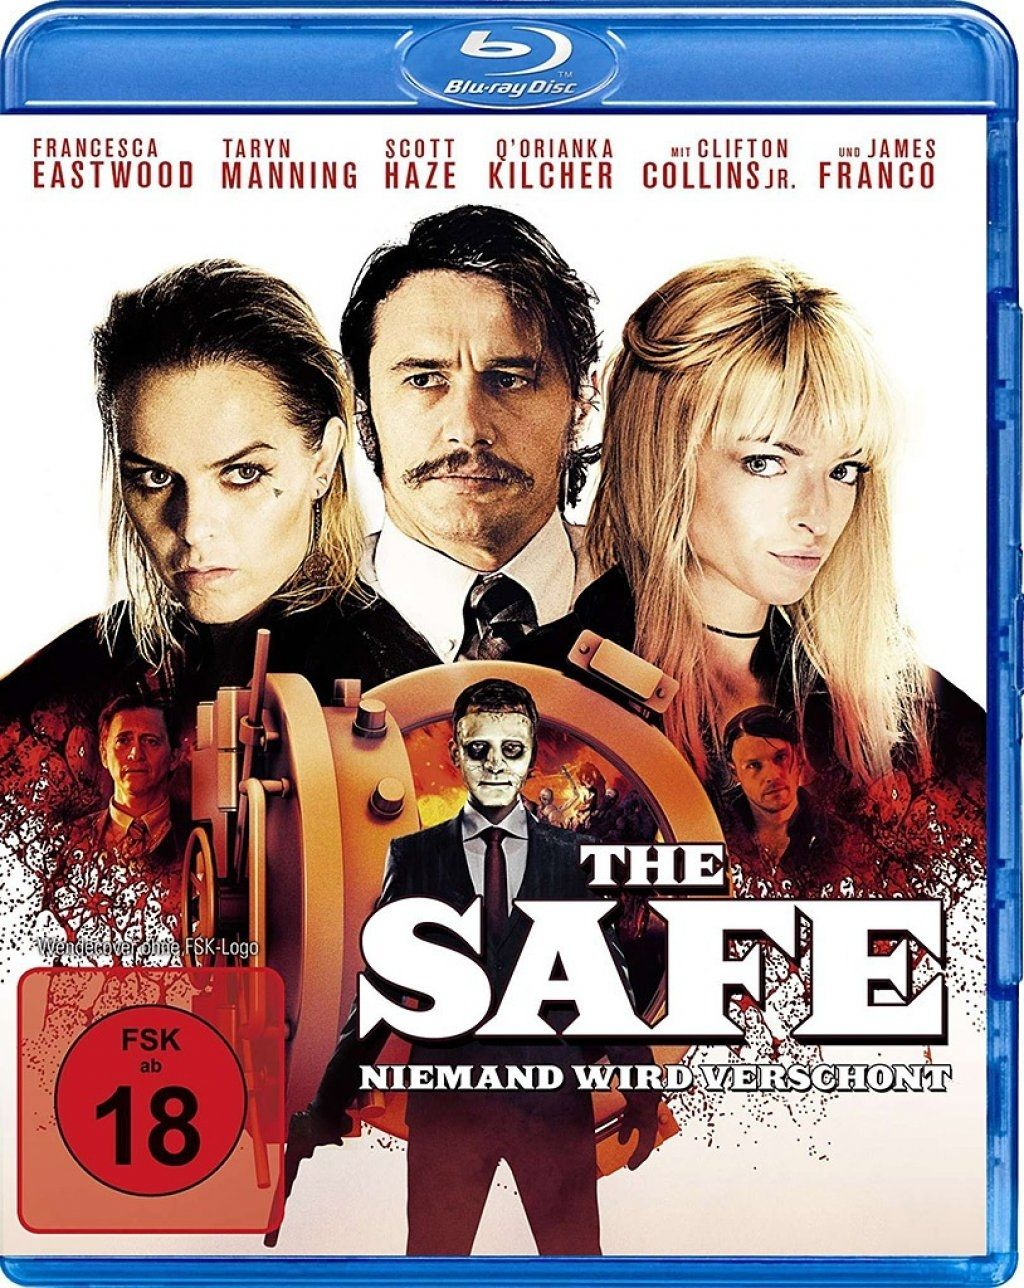 Safe, The - Niemand wird verschont (BLURAY)